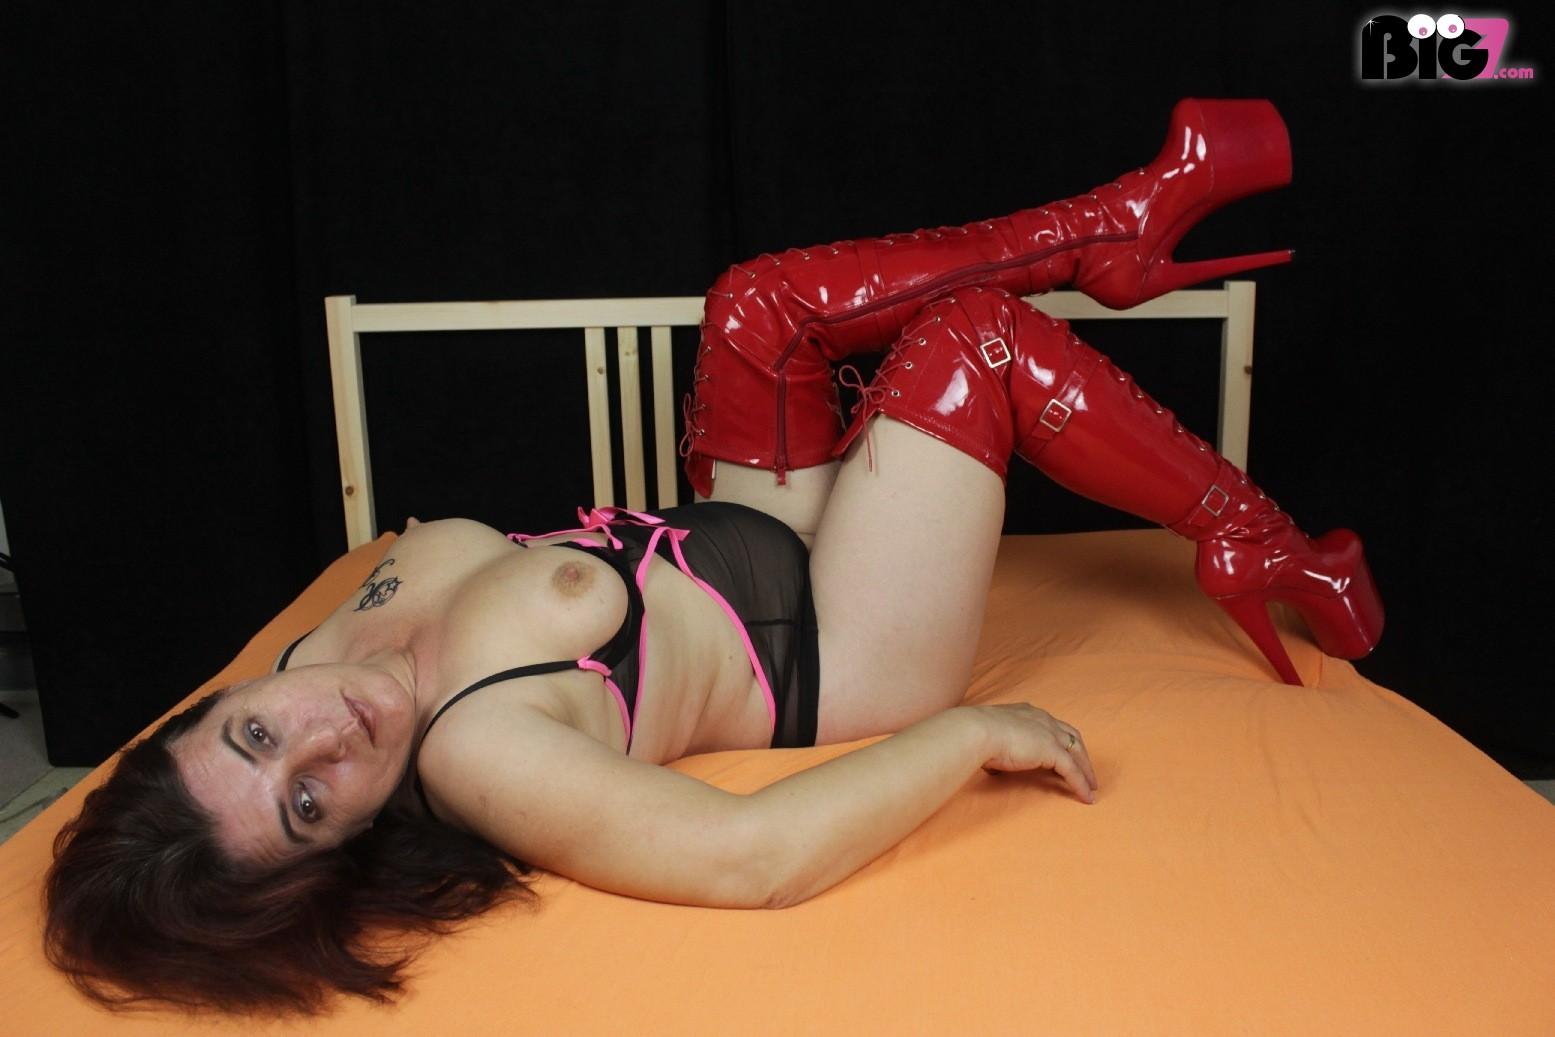 gangbang bayern online spiele erotik